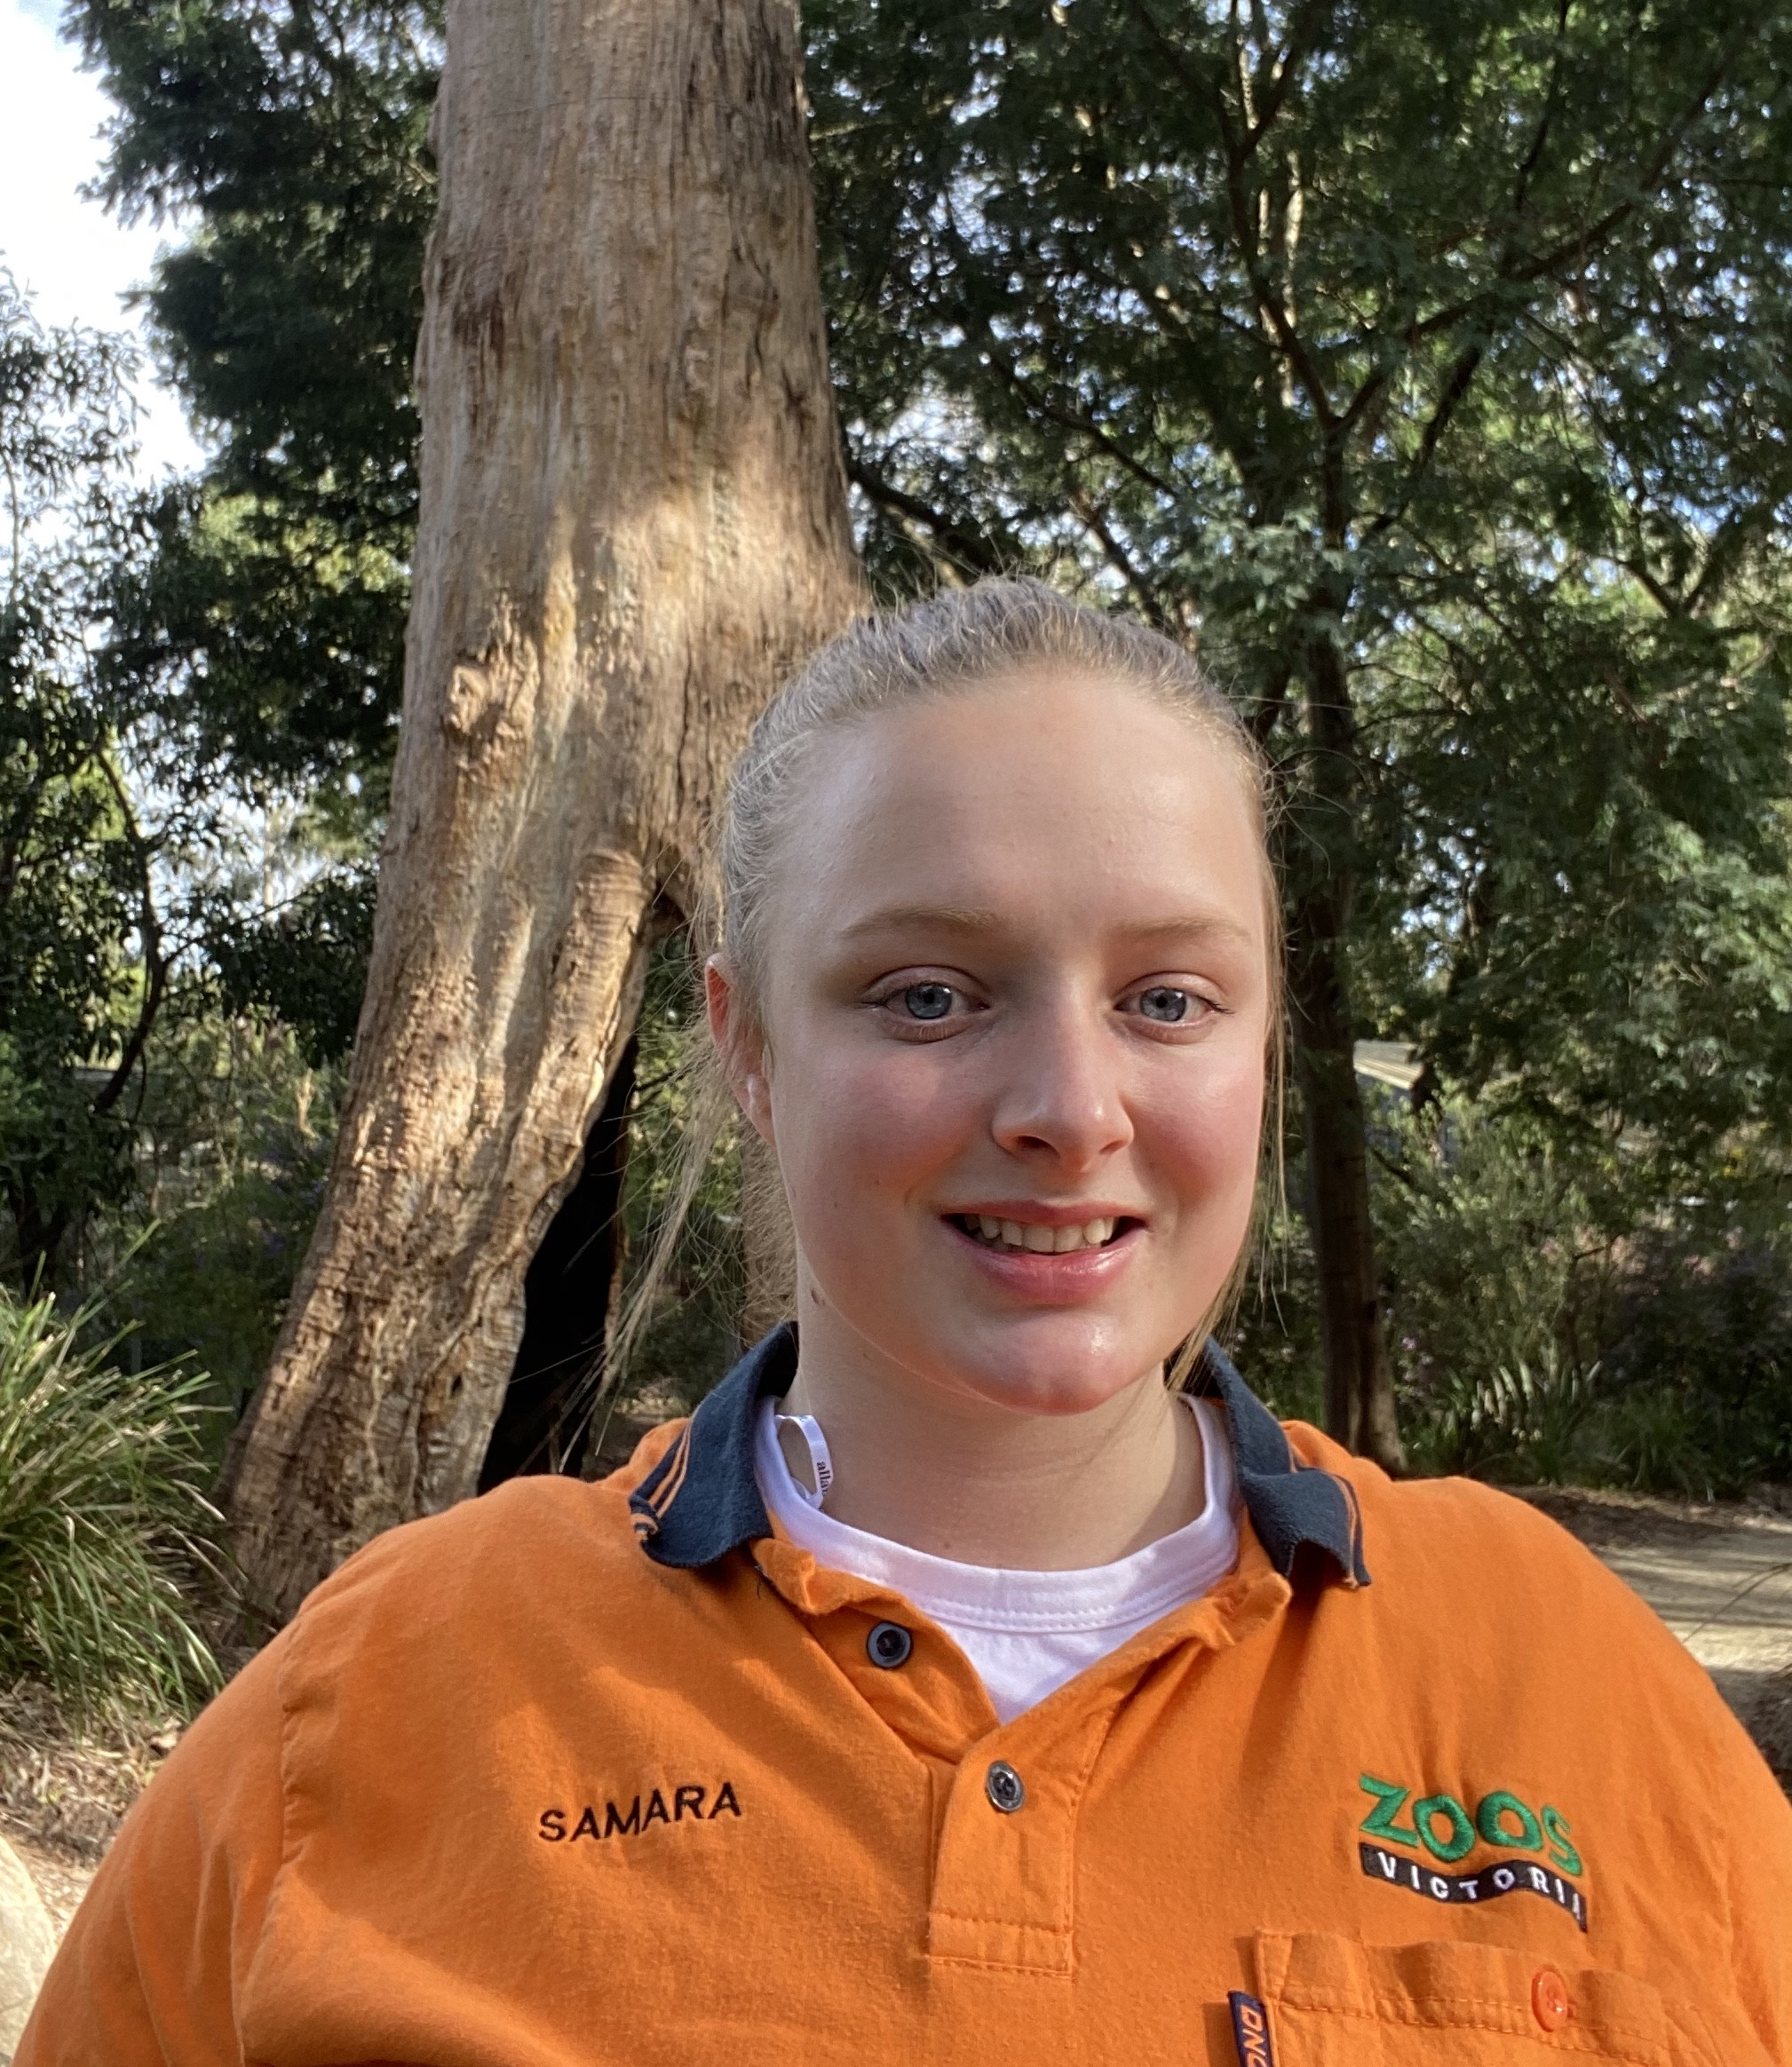 Samara Draper standing in front of a tree